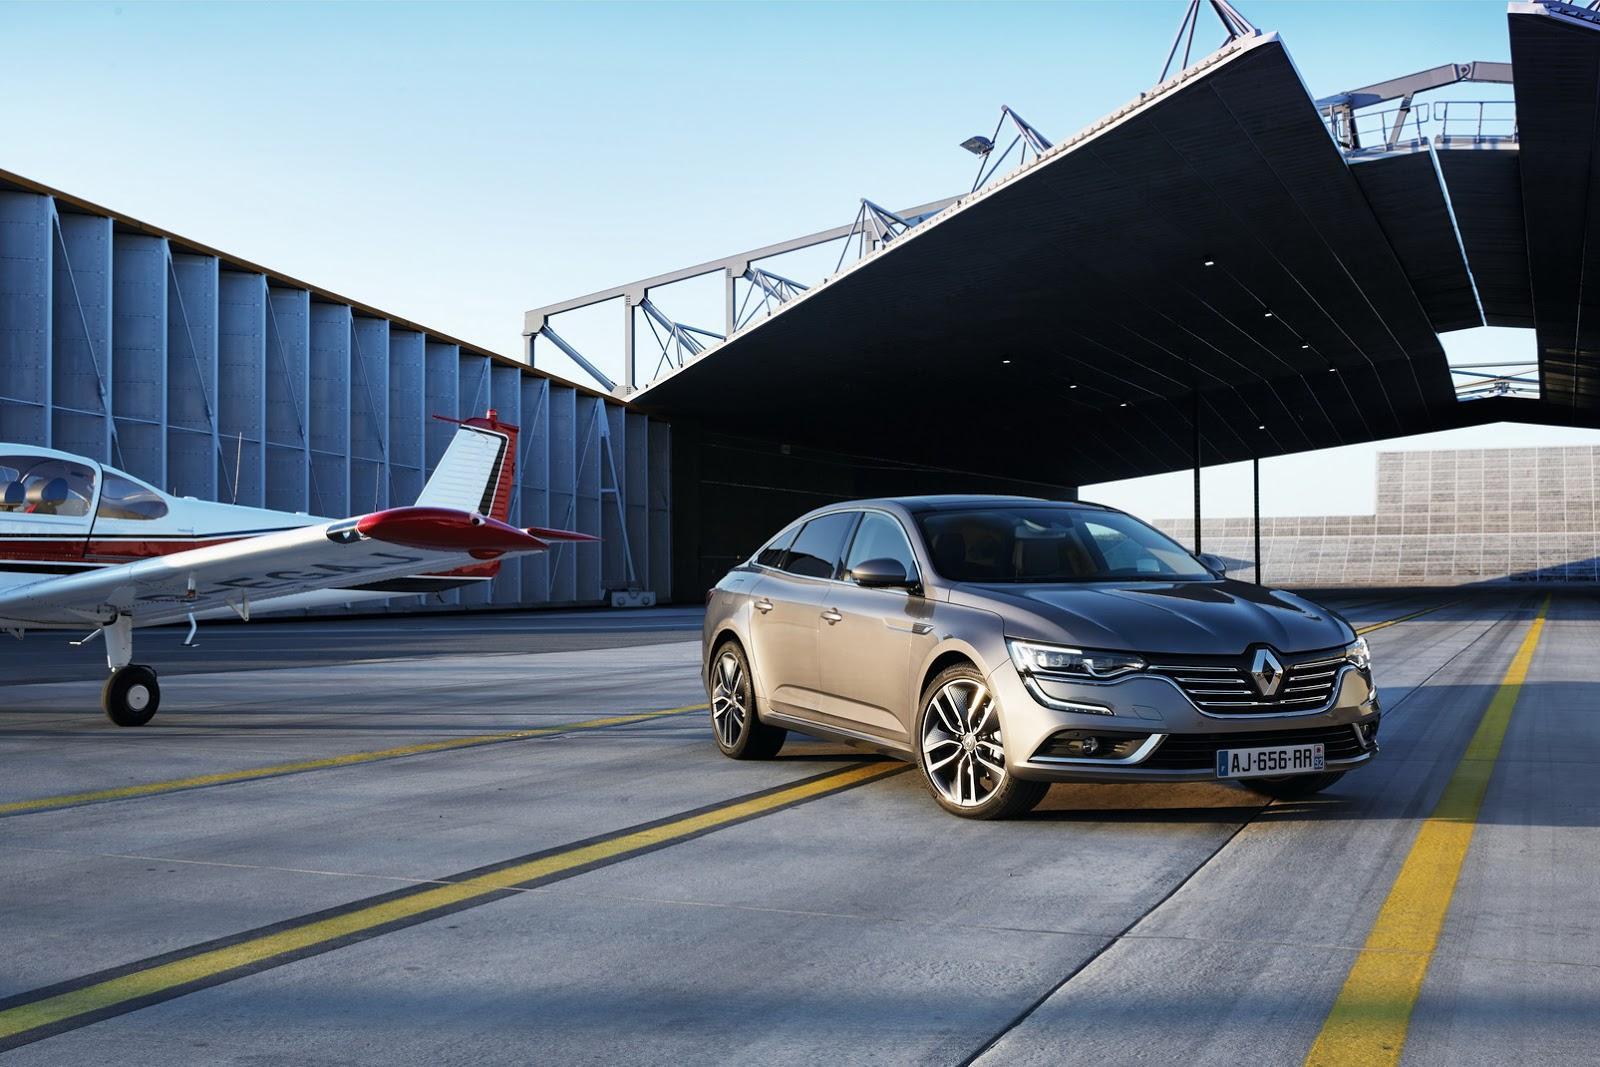 Renault Talisman - Renault Talisman